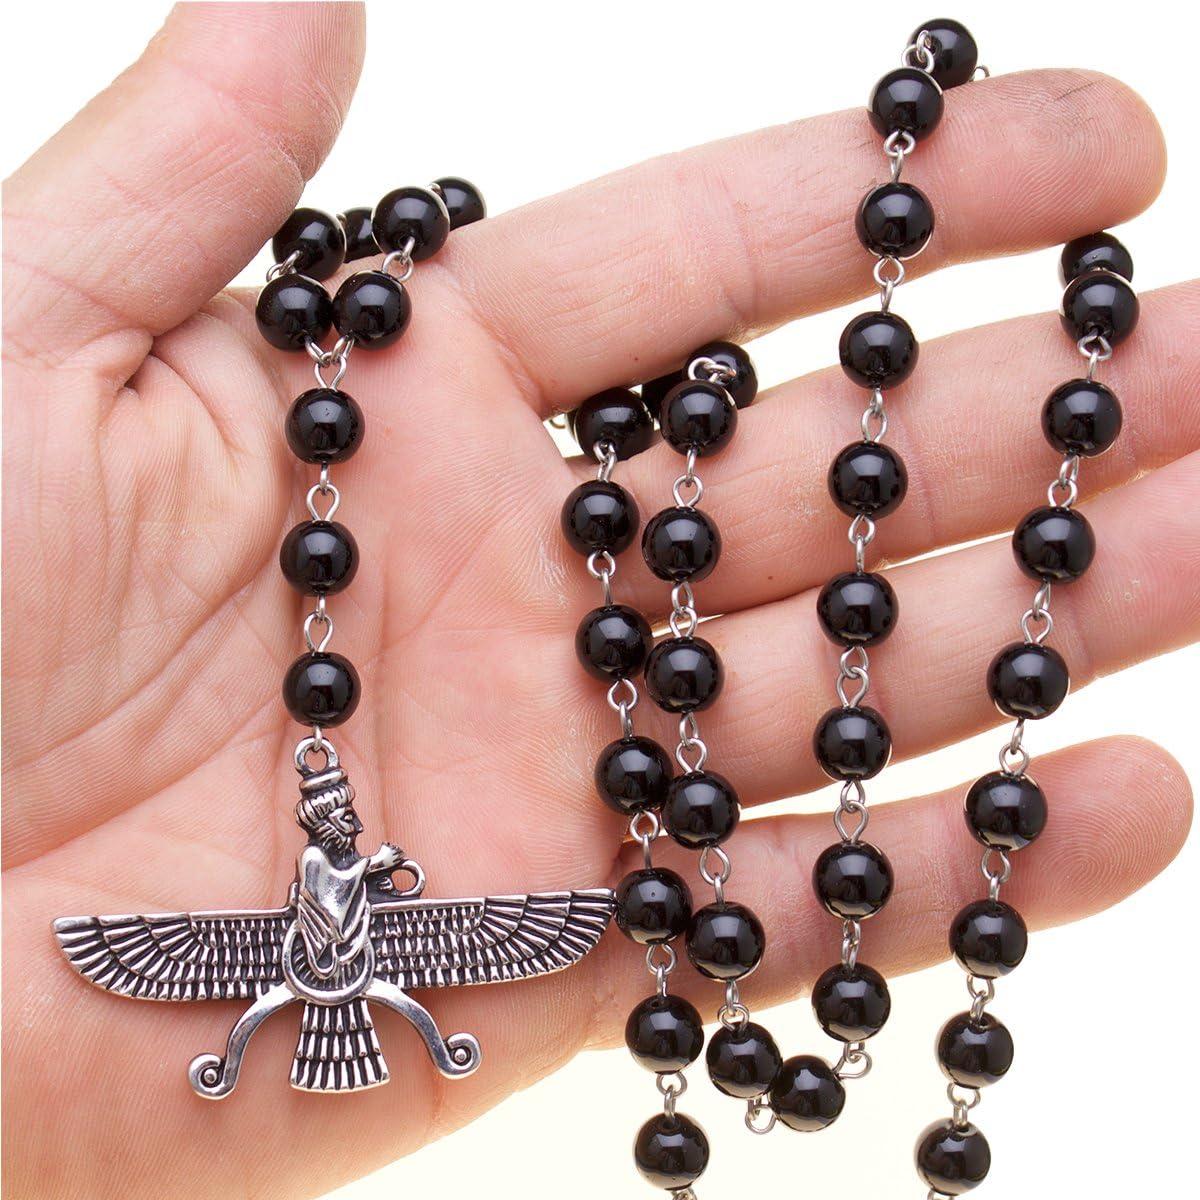 Asoodehdelan Silver Pt Persian Farvahar Necklace Agate Beads Gift Persia Farsi Parsi